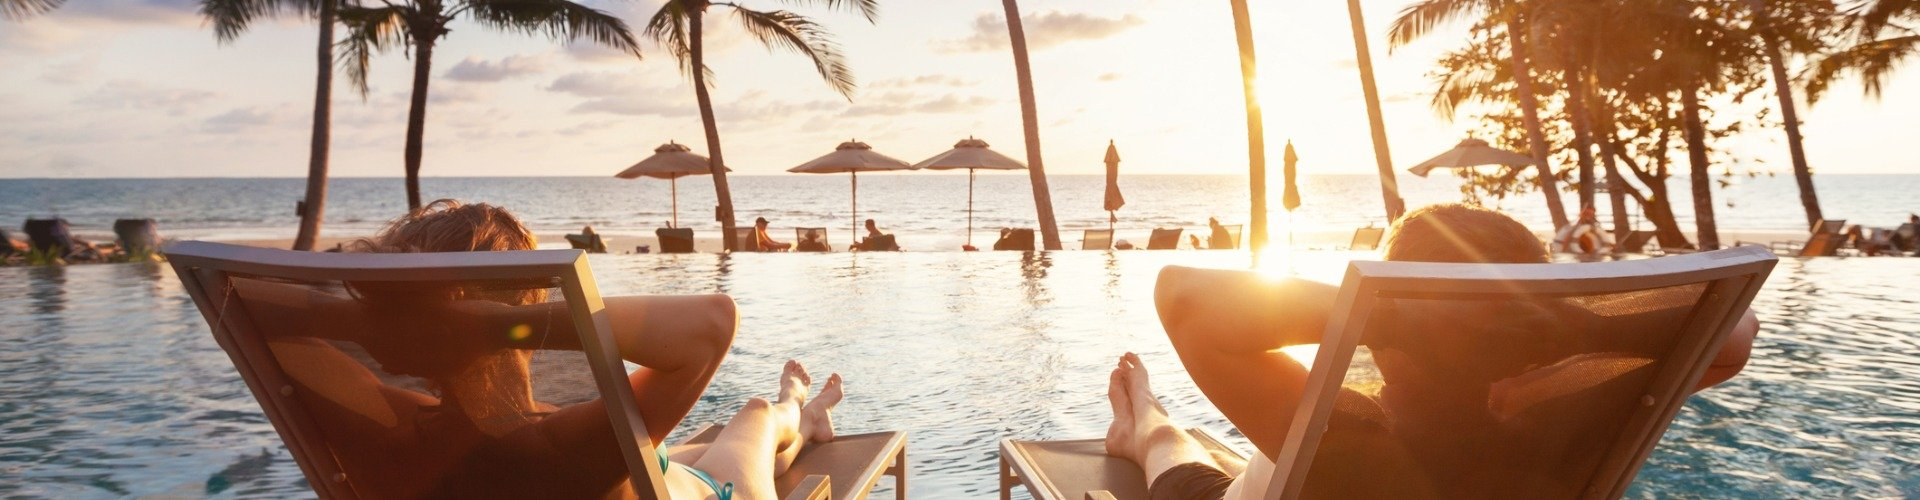 Hotels mit Adults-Only-Bereichen